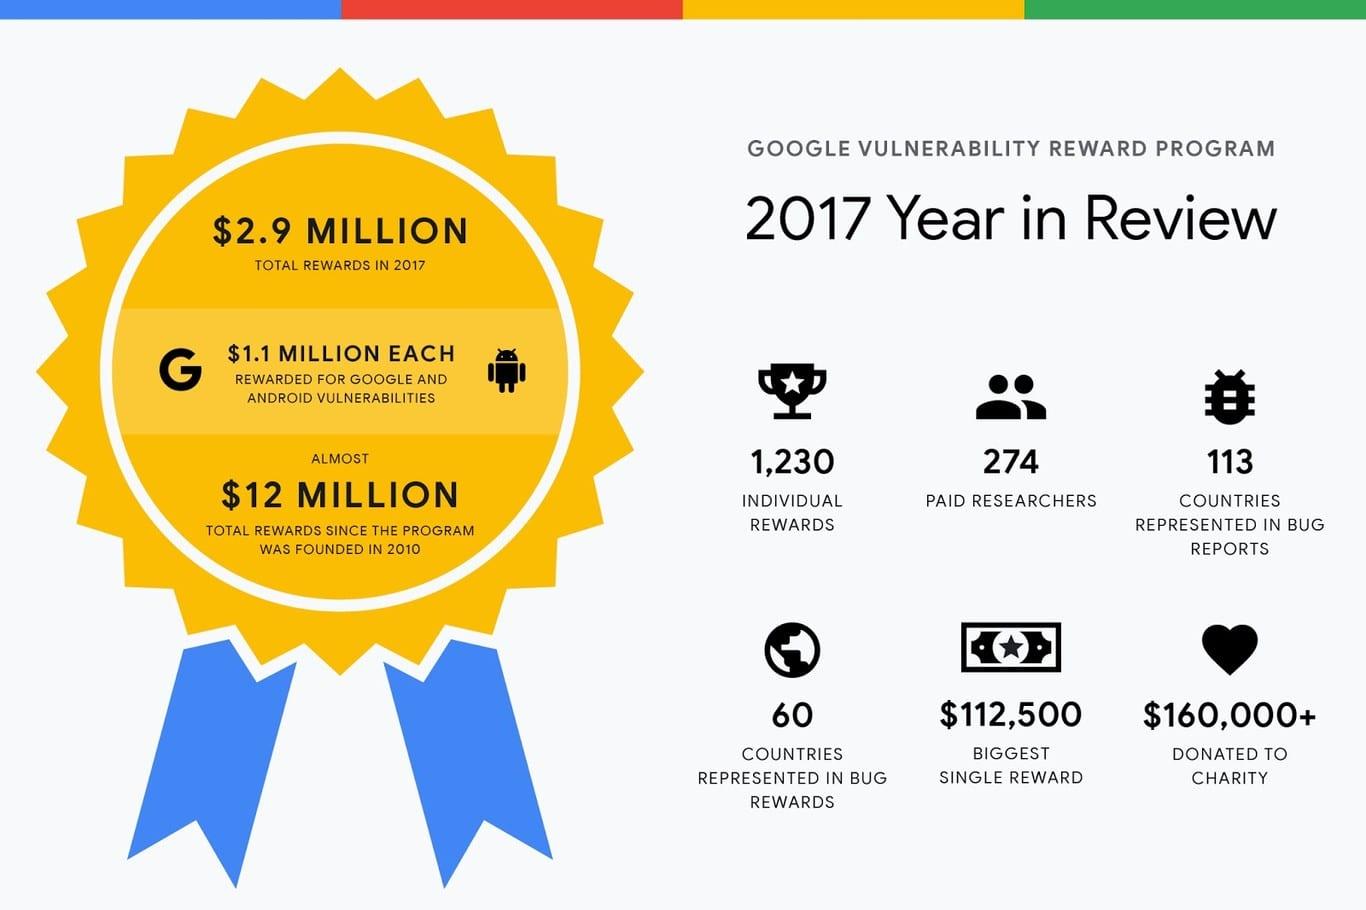 Recompensas Google